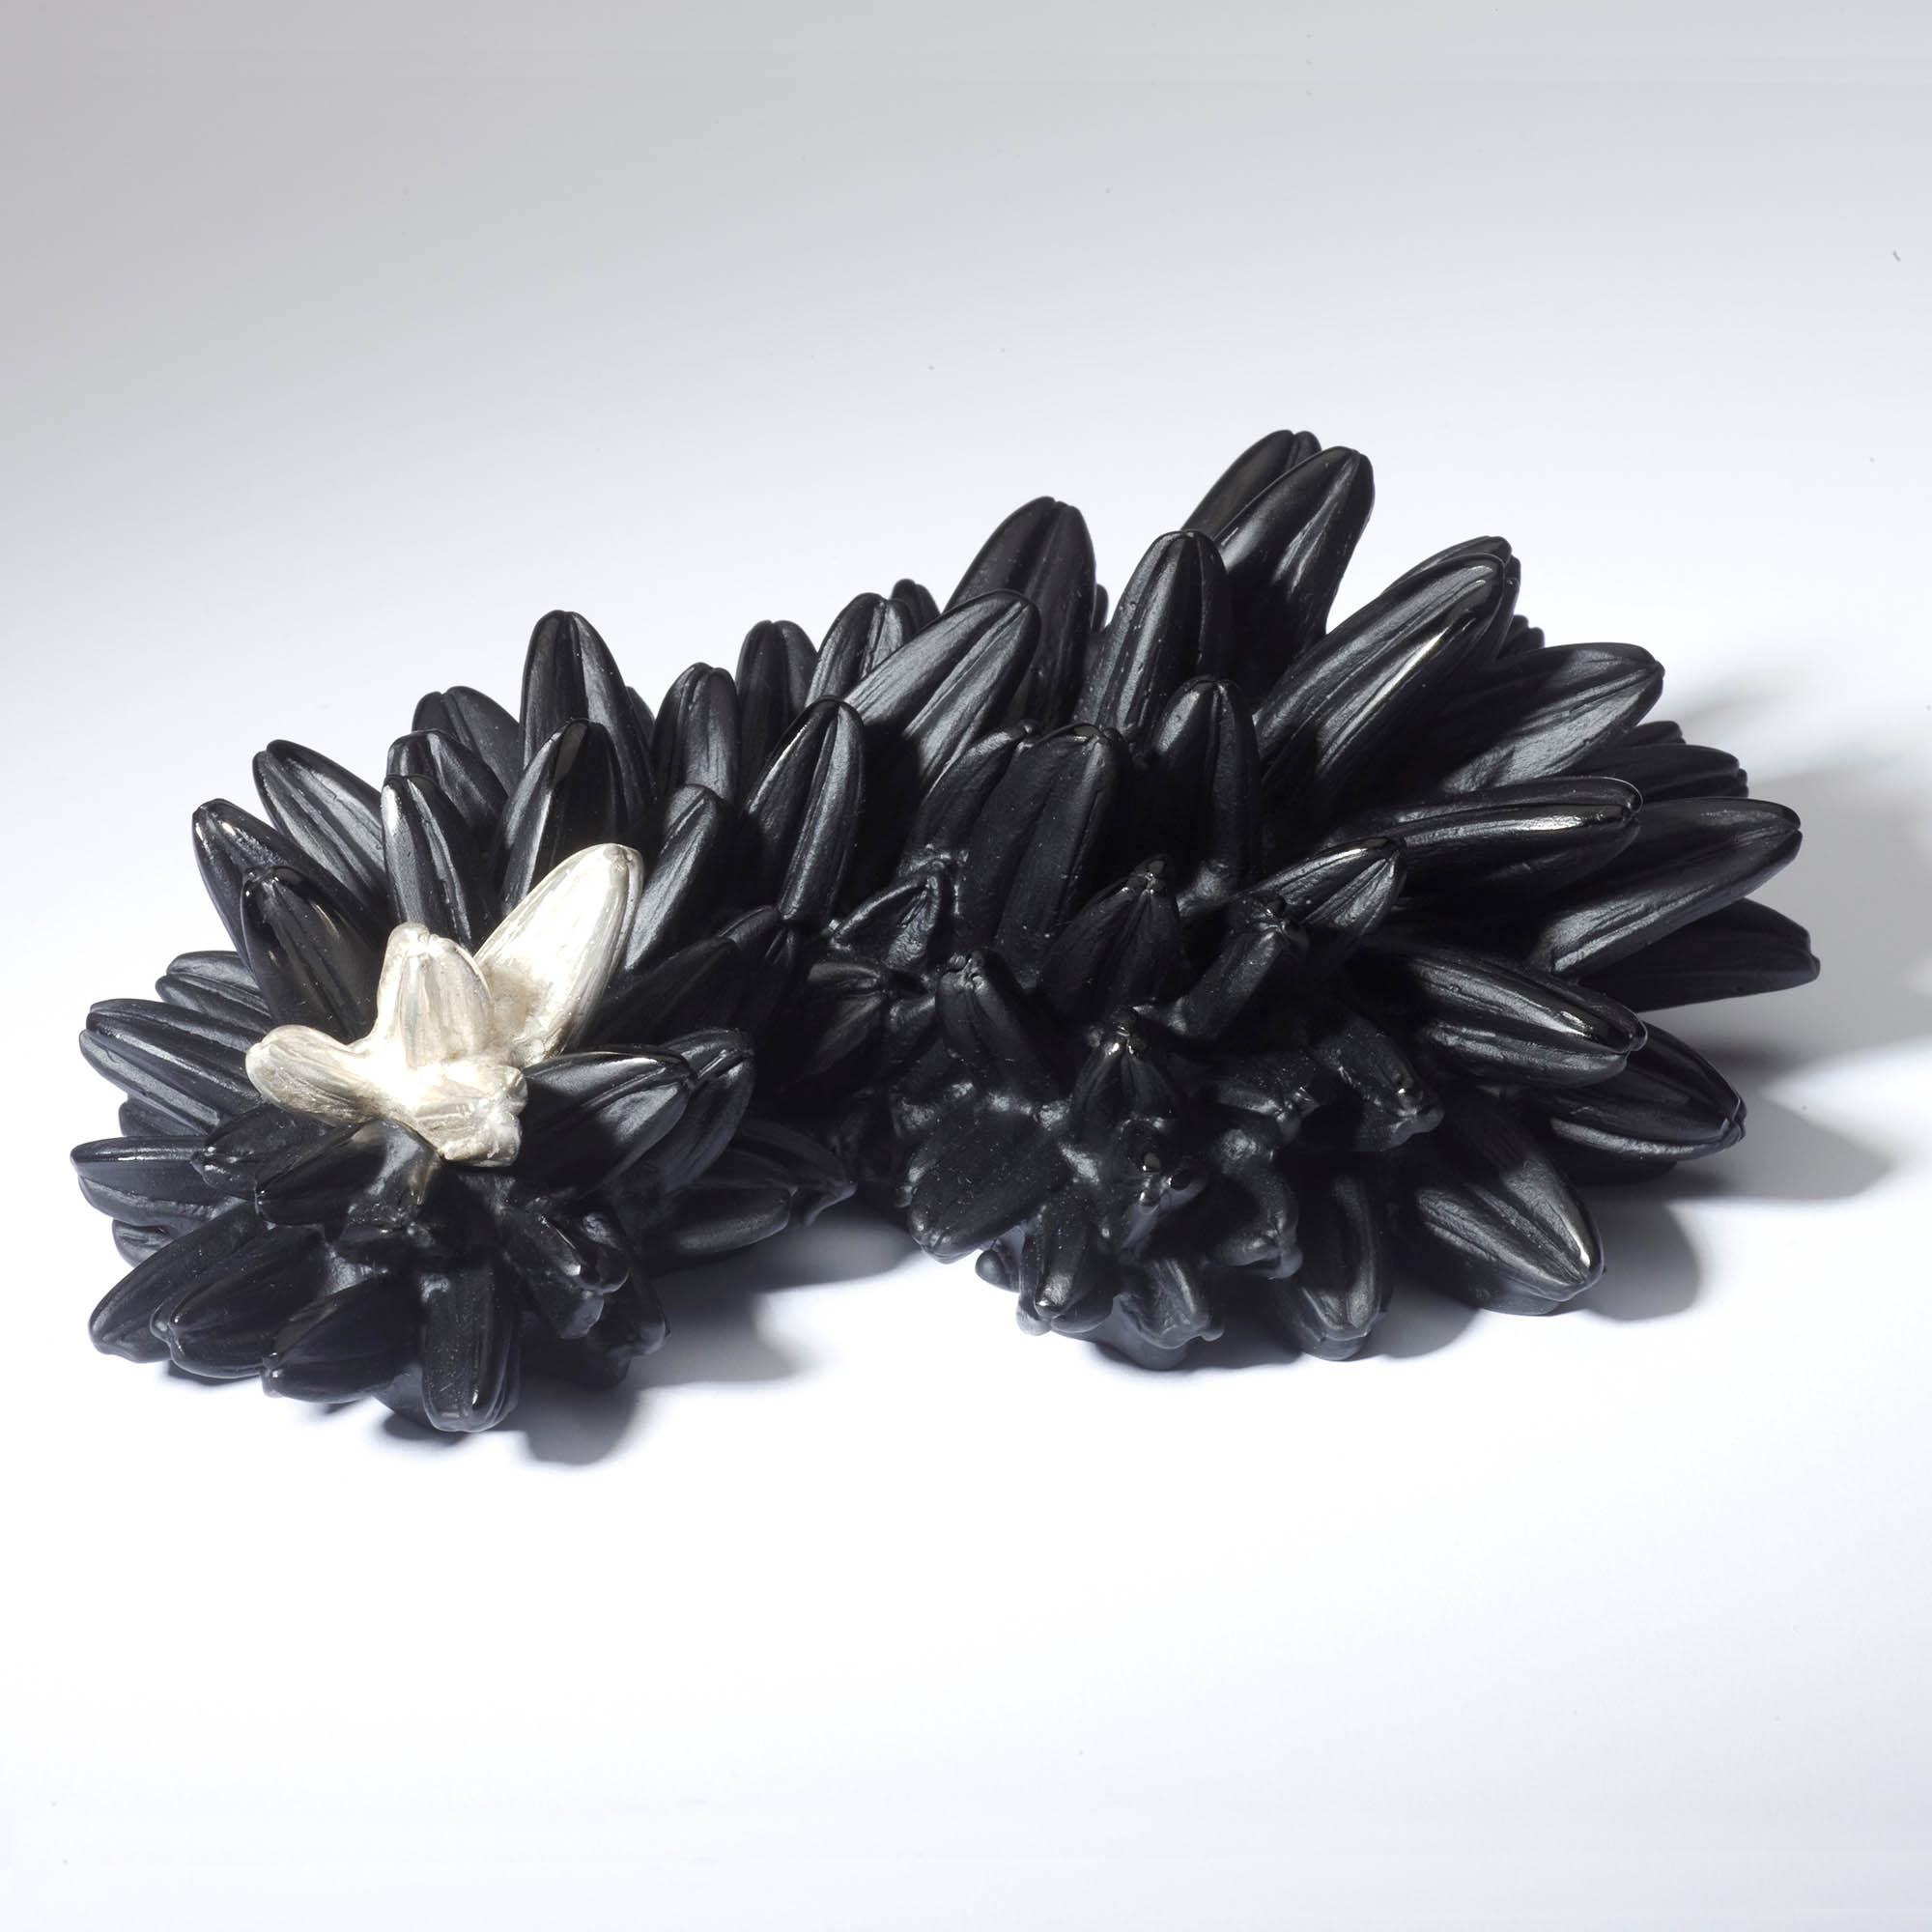 Small Urchin | 2009 | Angela Jarman